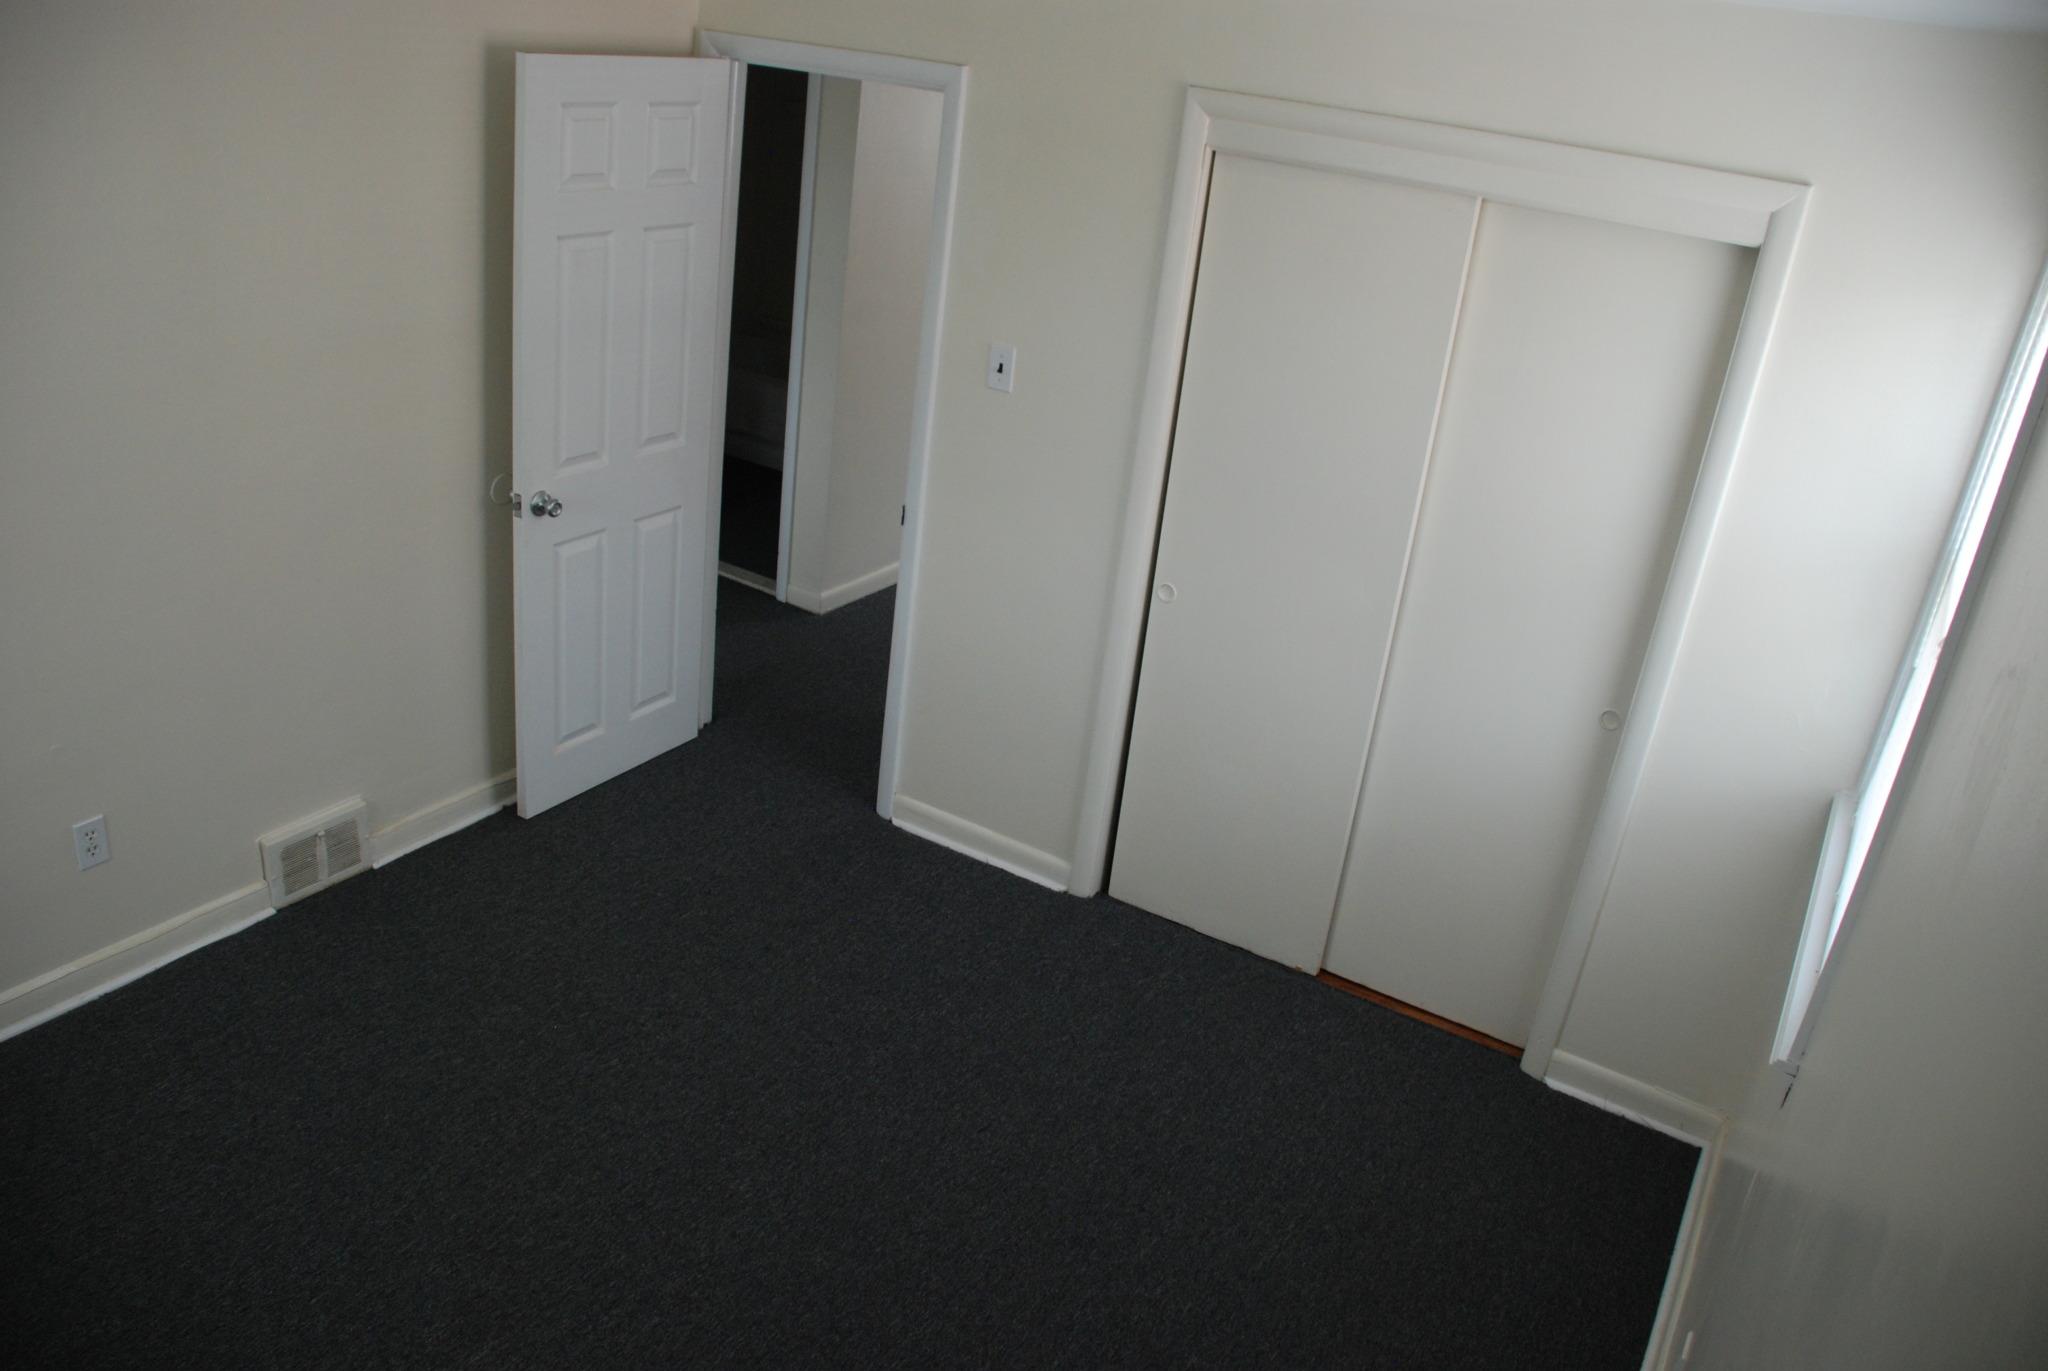 129 Bridge interior bedroom